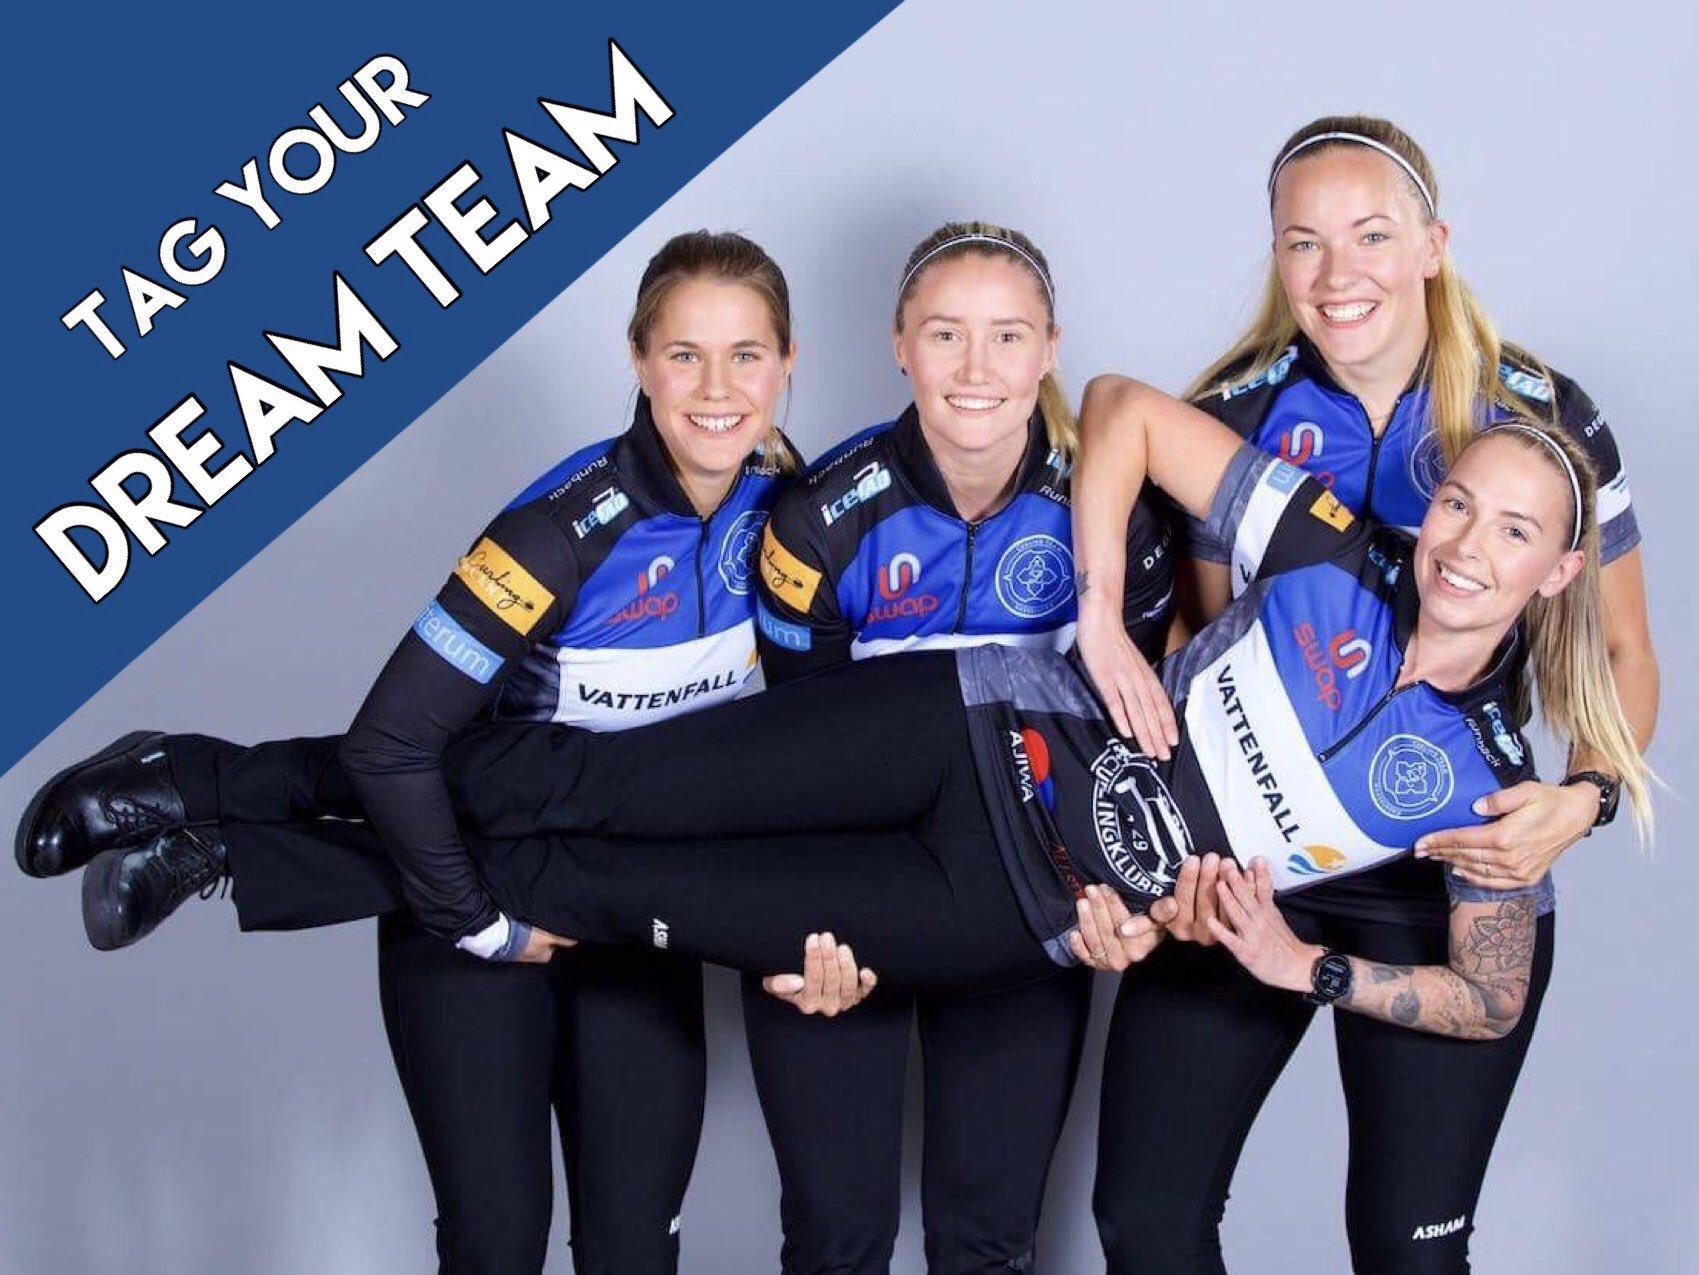 Team Hasselborg on Twitter: